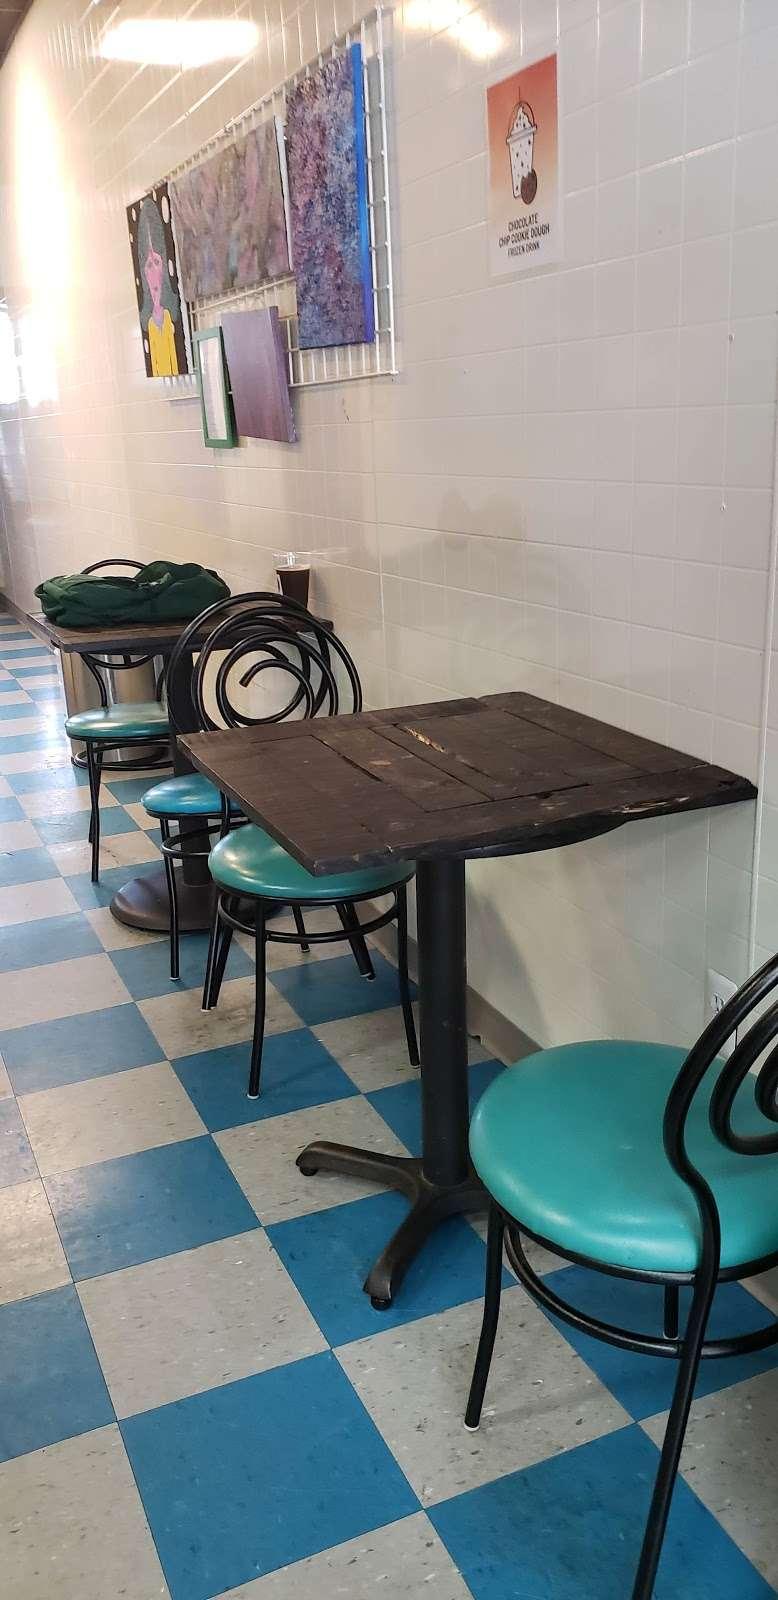 Stray Cat Brew - cafe  | Photo 7 of 10 | Address: 108 W Pleasant Ave, Maywood, NJ 07607, USA | Phone: (201) 682-6306